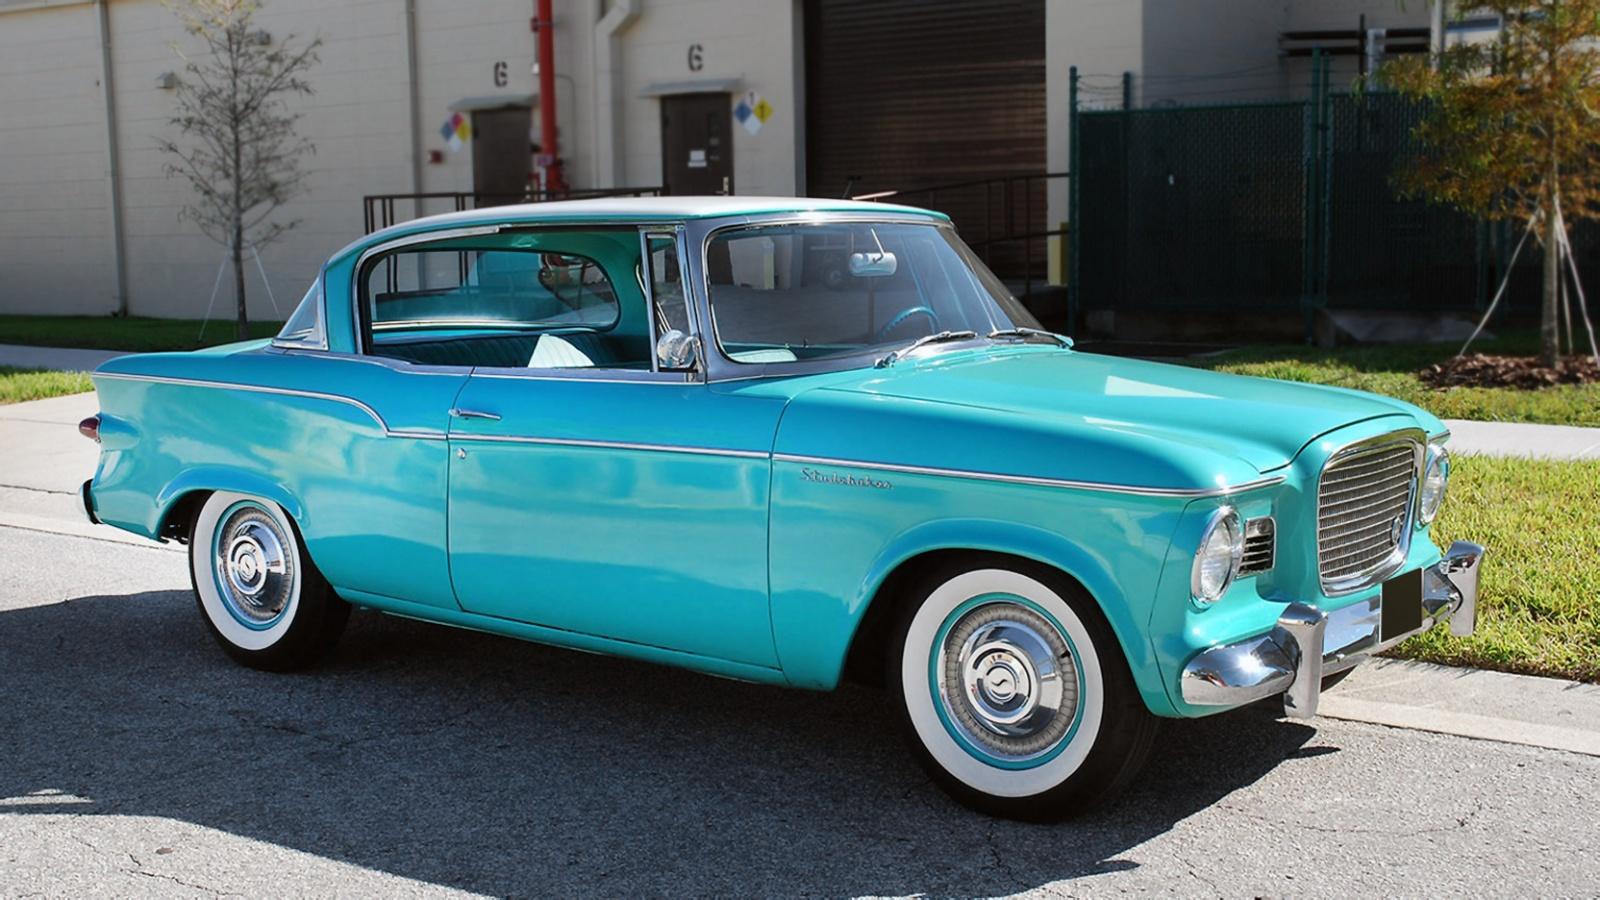 Regal Beauty: 1959 Studebaker Lark VIII Regal